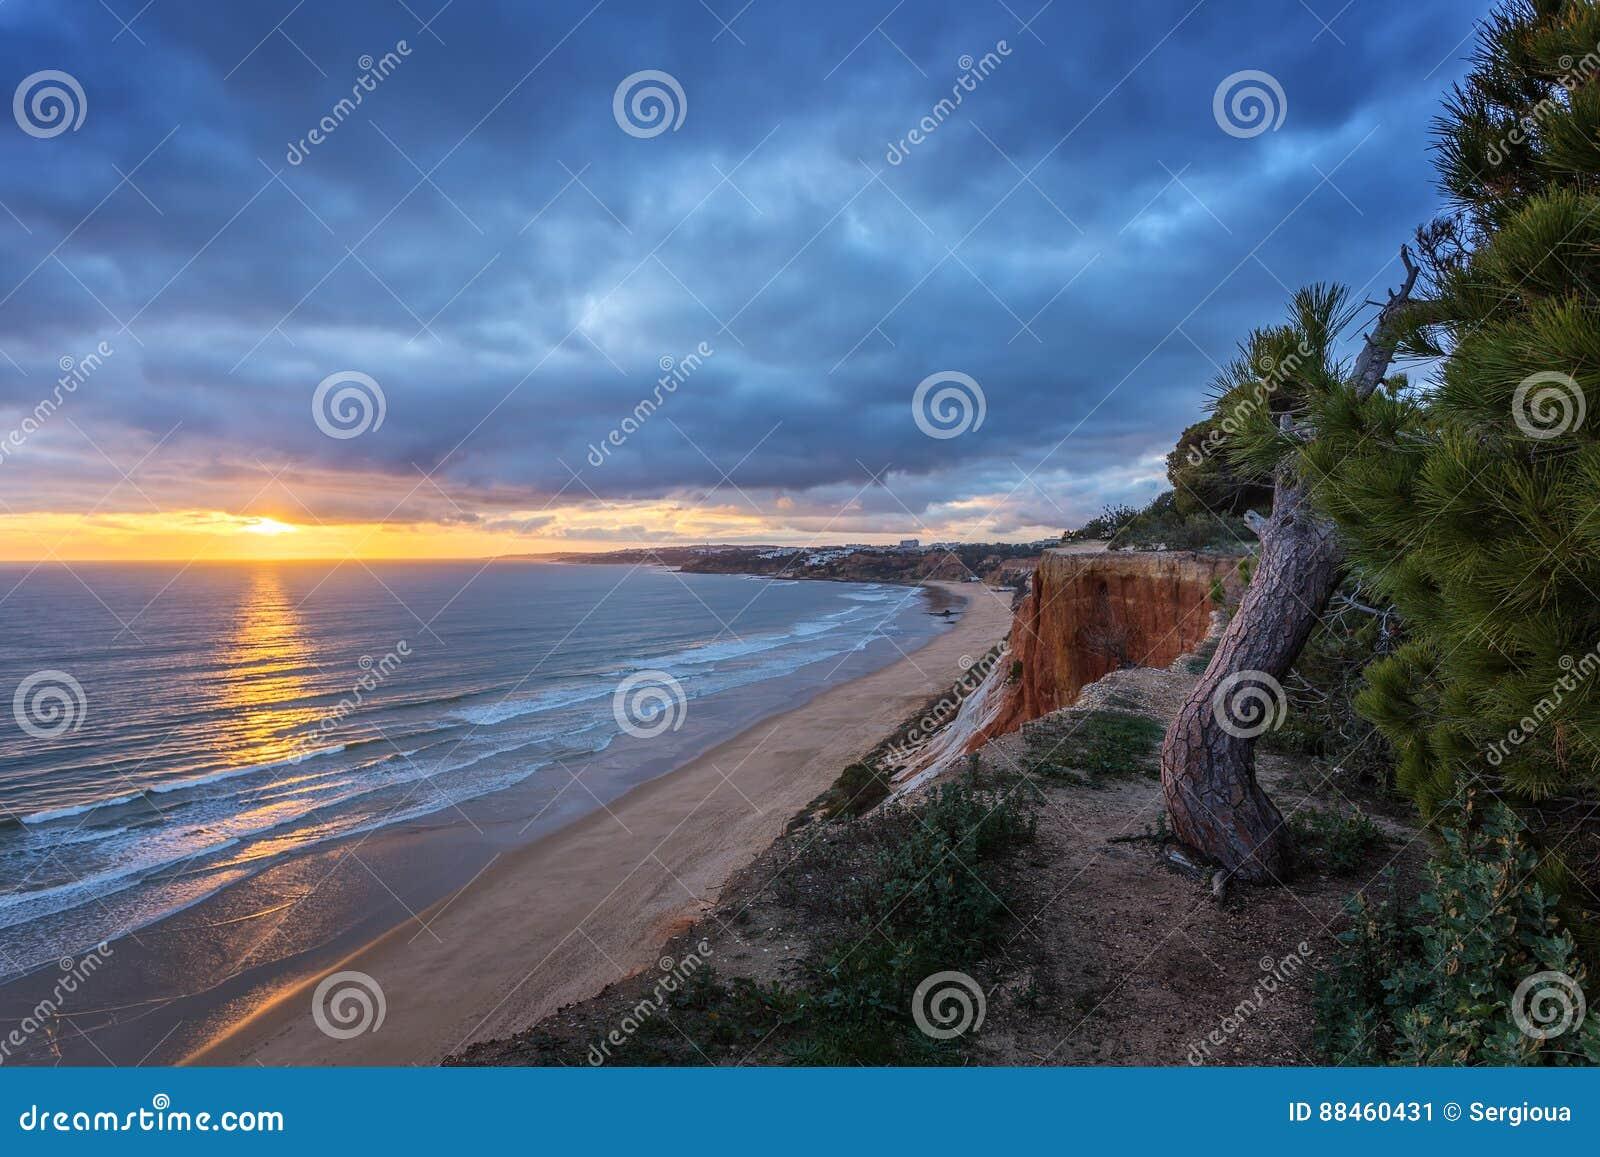 Amazing sea landscape on the mountains of Falesia. Albufeira